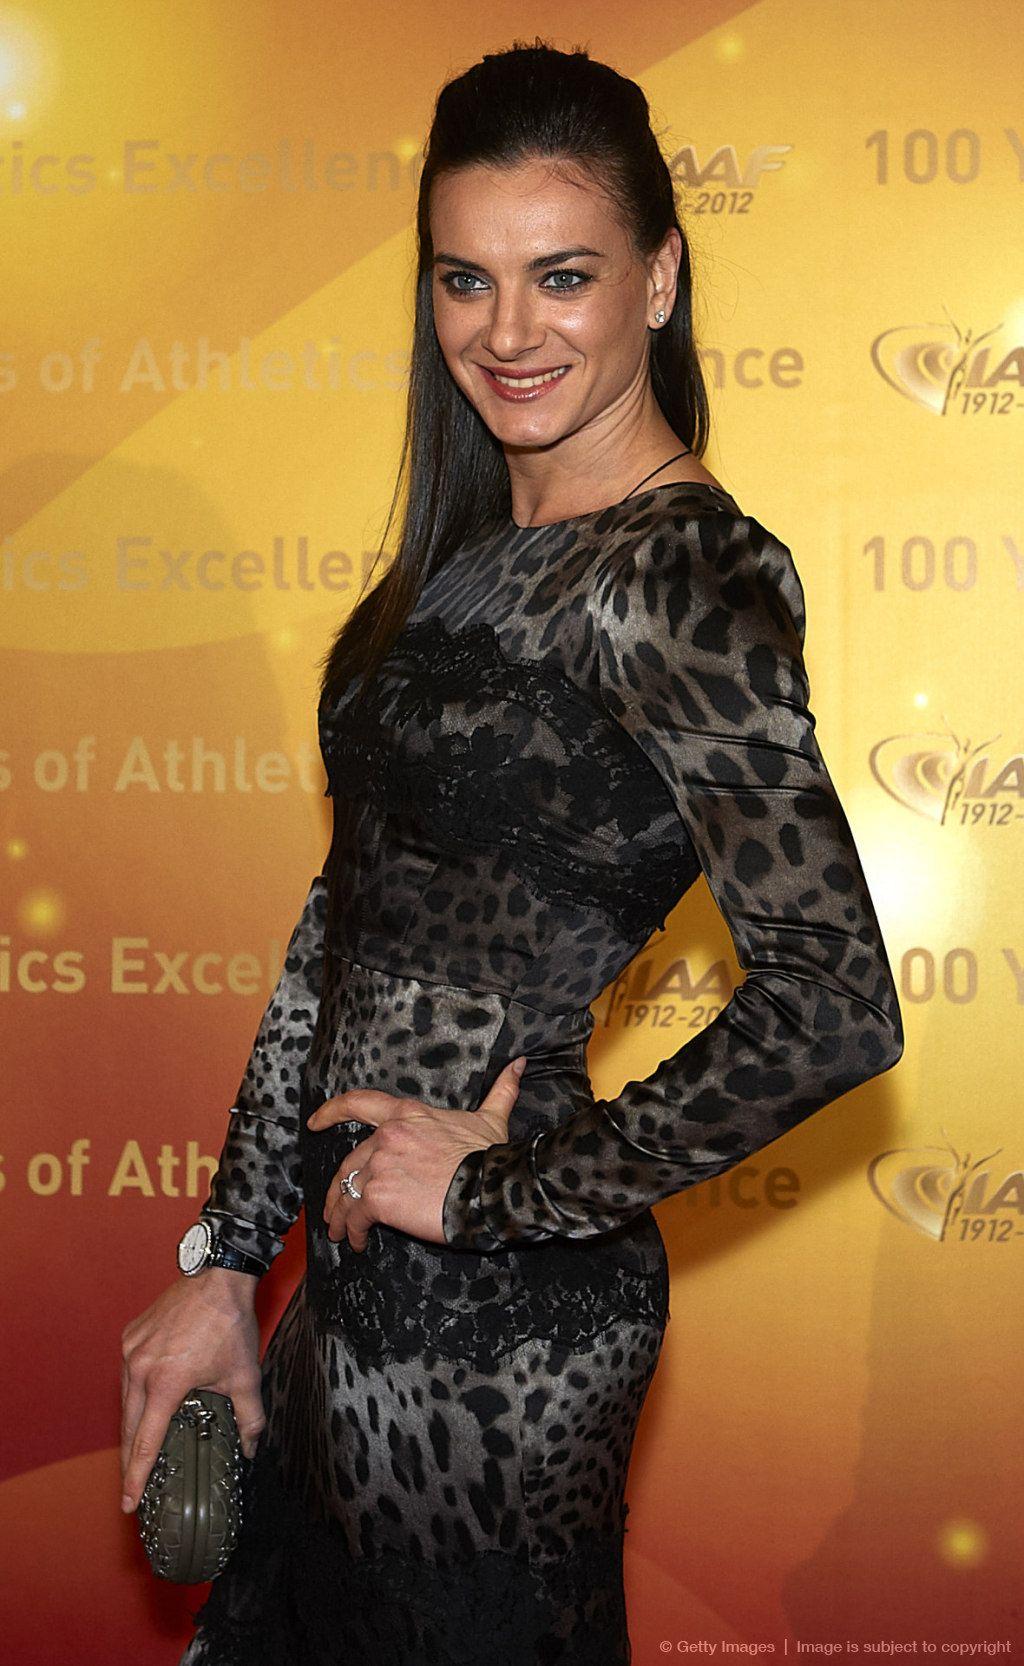 Irina Shayk: Sports Illustrated cover girl 2011 - Photo 1